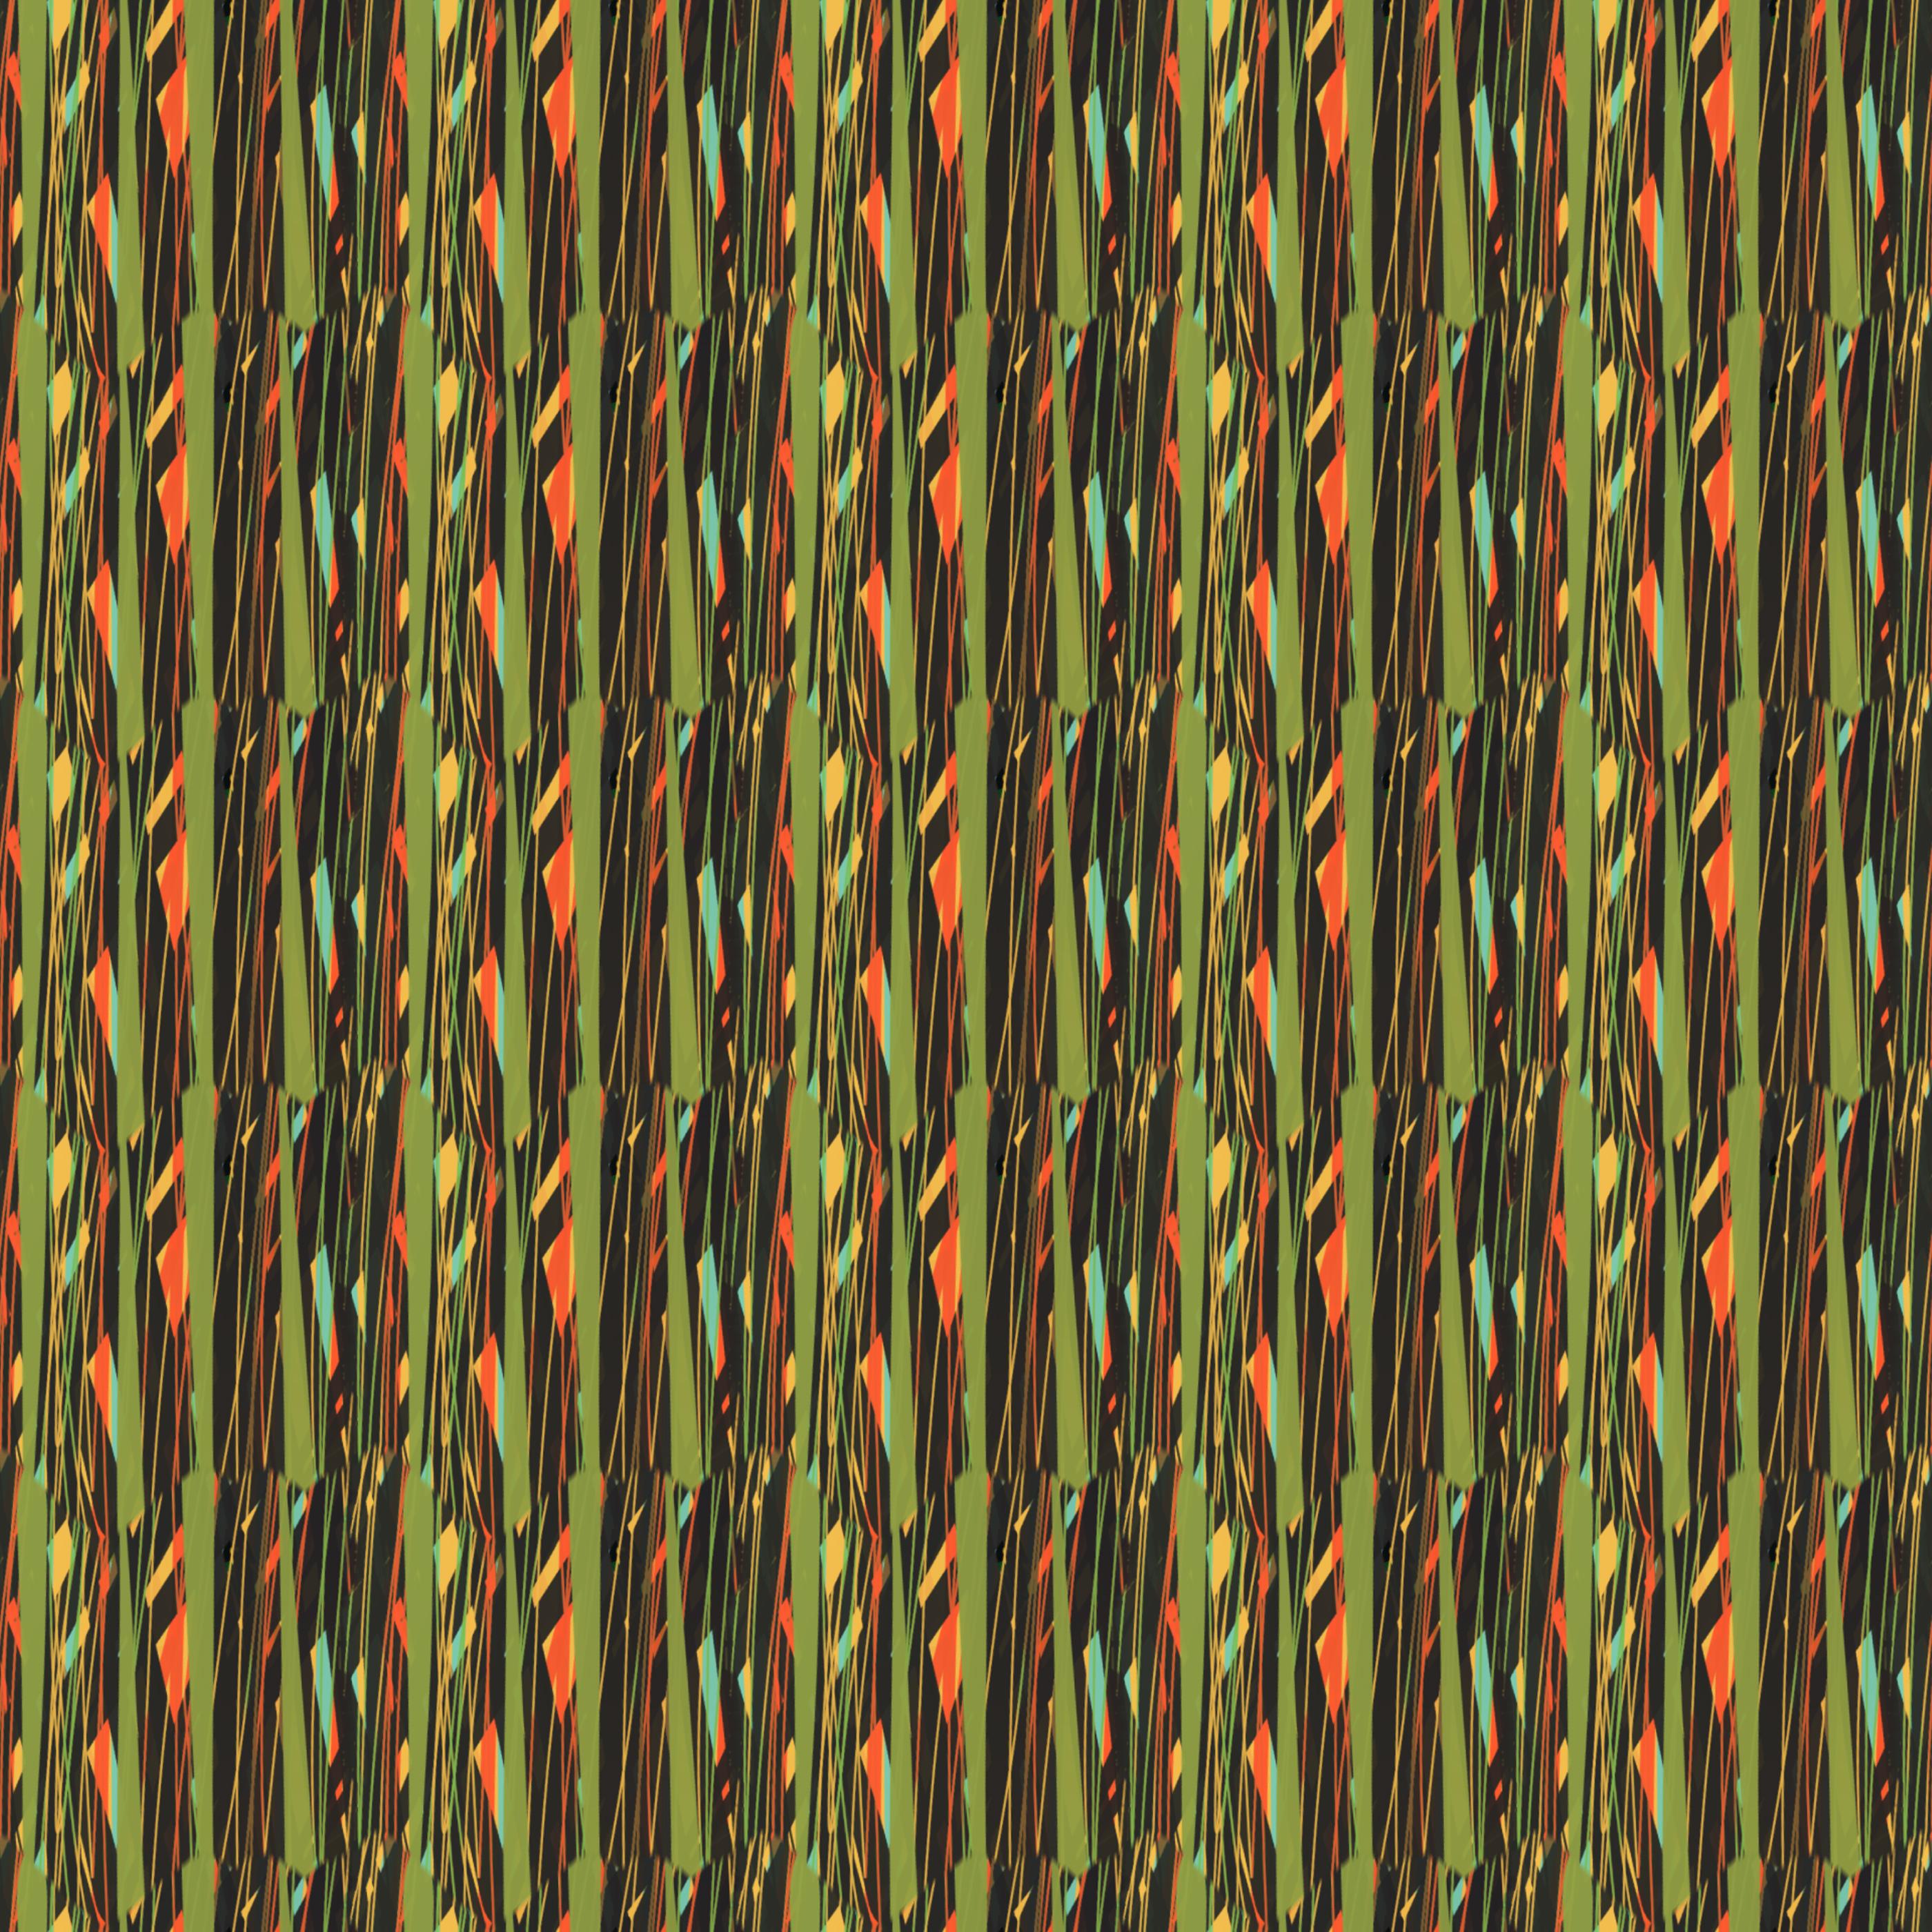 Natural Bush Pattern Vertical Lines